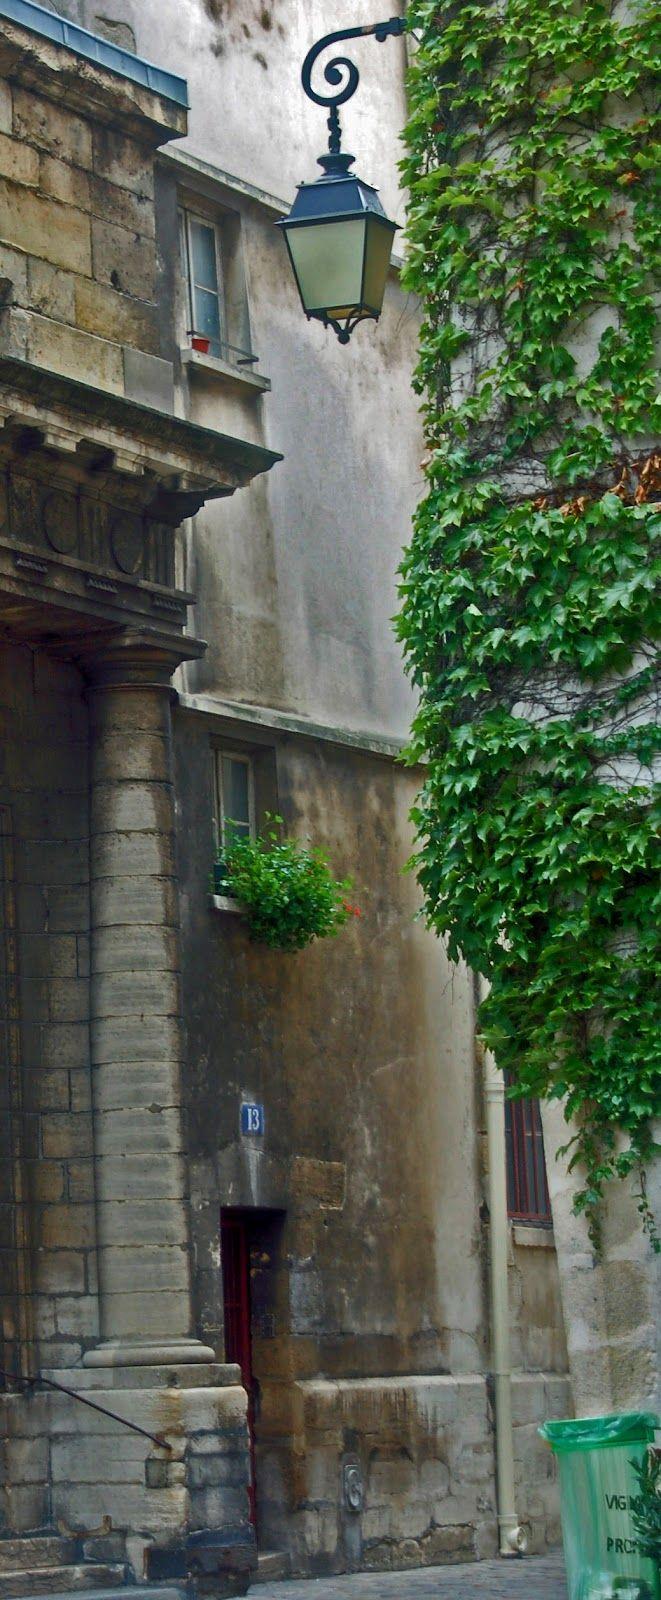 4th arrondissement - rue des Barres.  It's so magical!